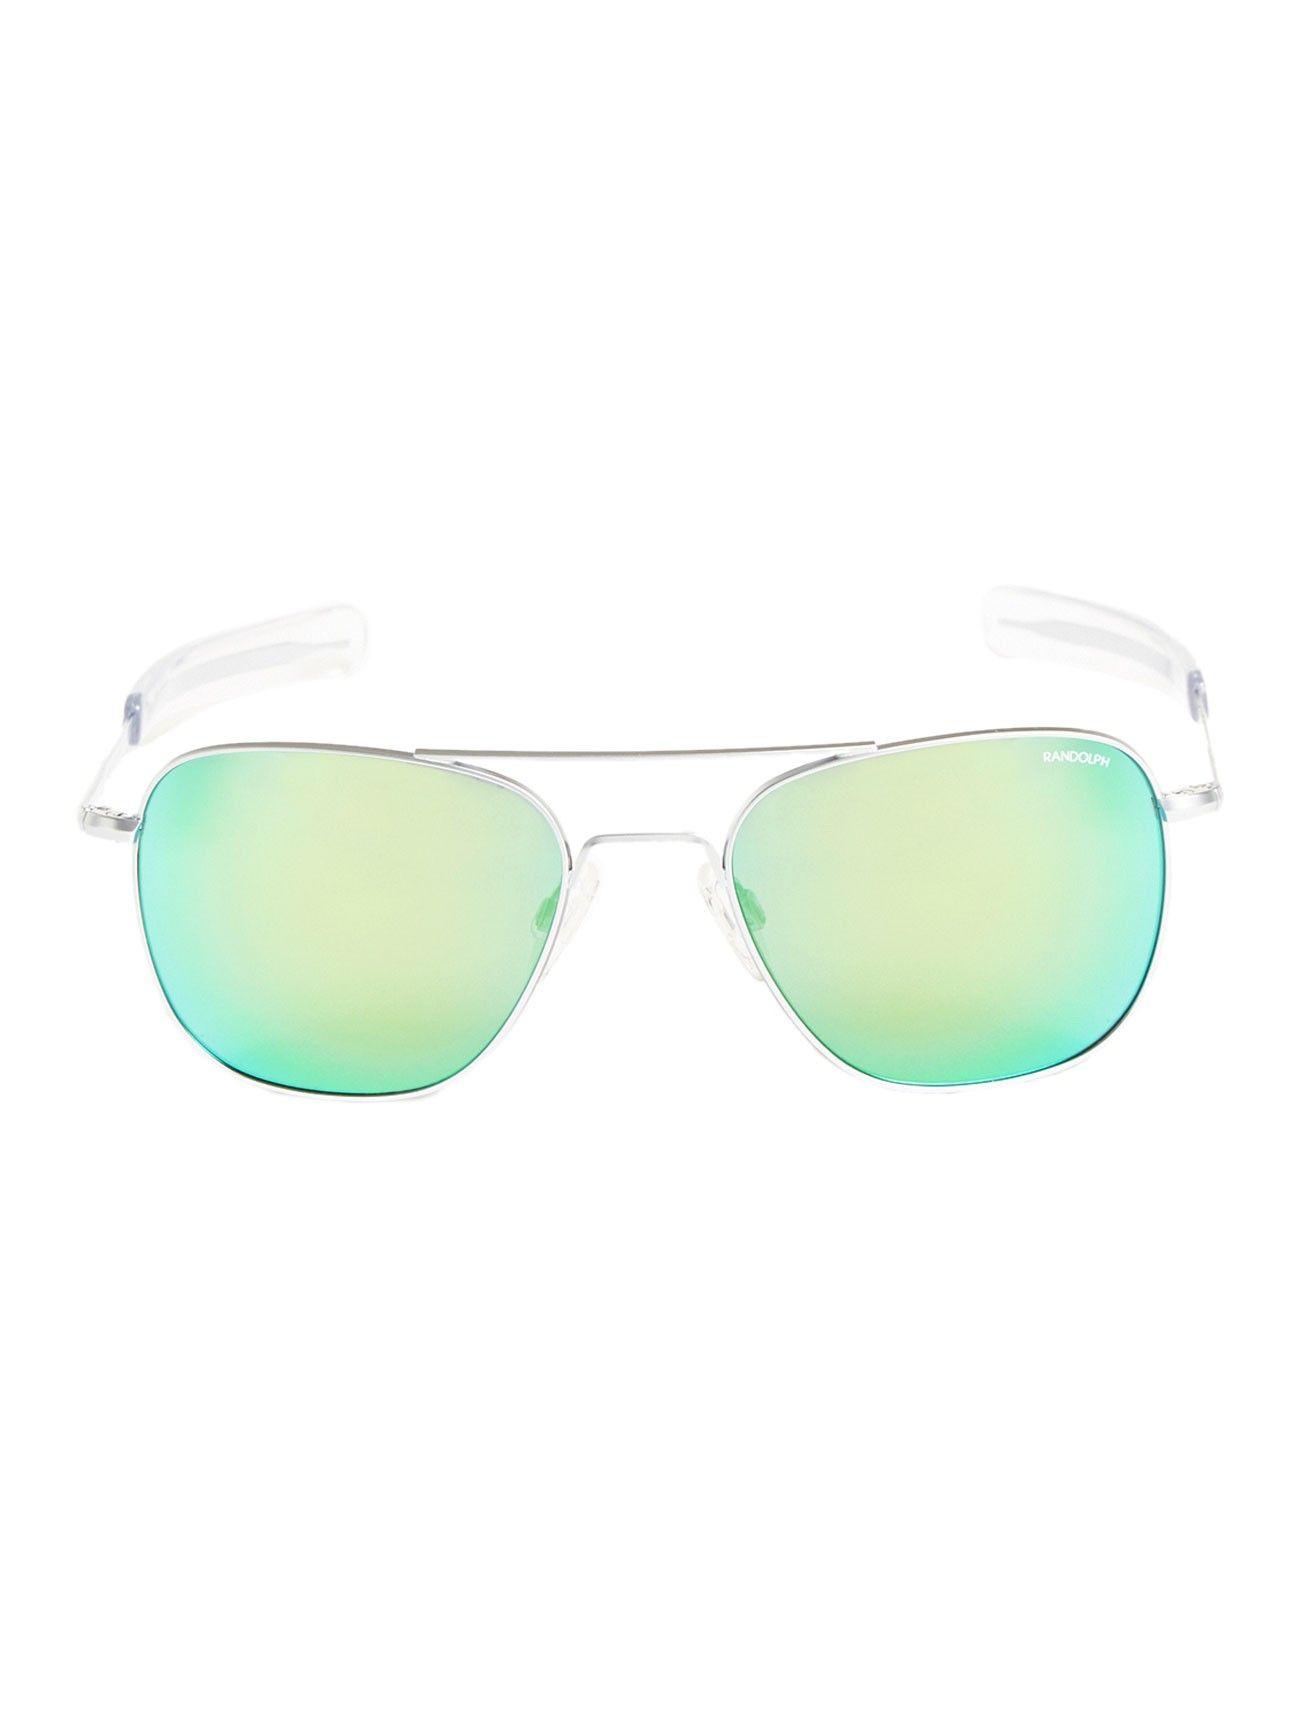 8666a68272 Randolph Engineering Bayonet Polarized Aviators - Green Flash - These Bayonet  sunglasses from Randolph Engineering feature